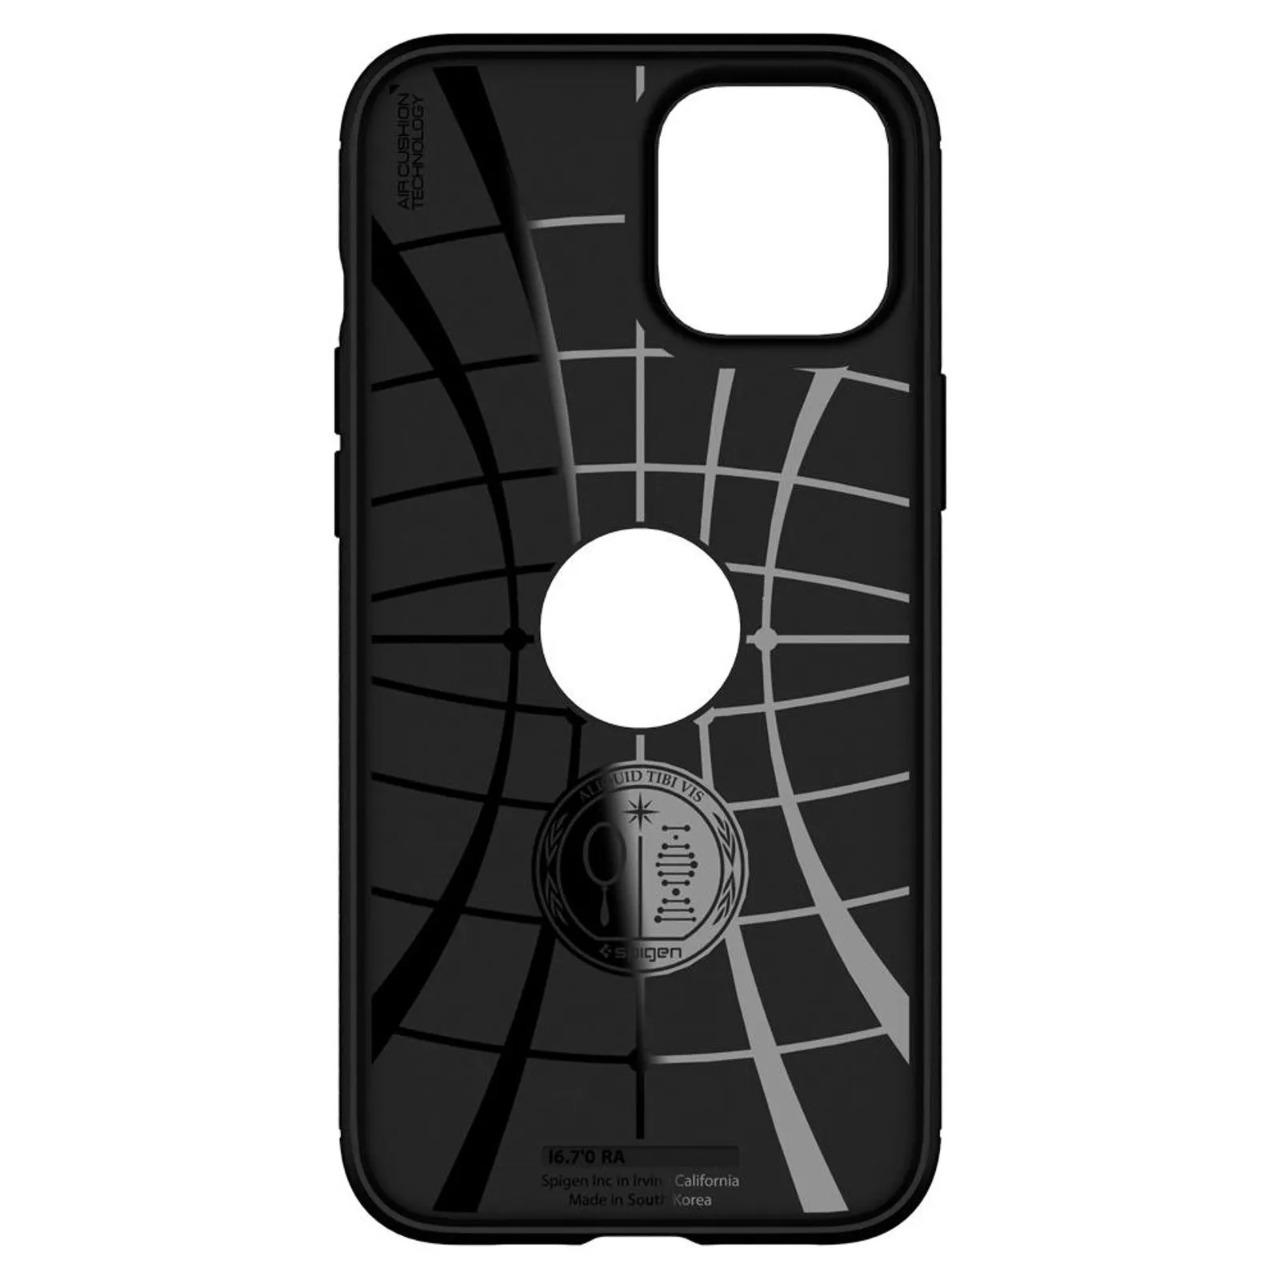 Capa Rugged Armor Matte Black Compatível com iPhone 12/12 Pro